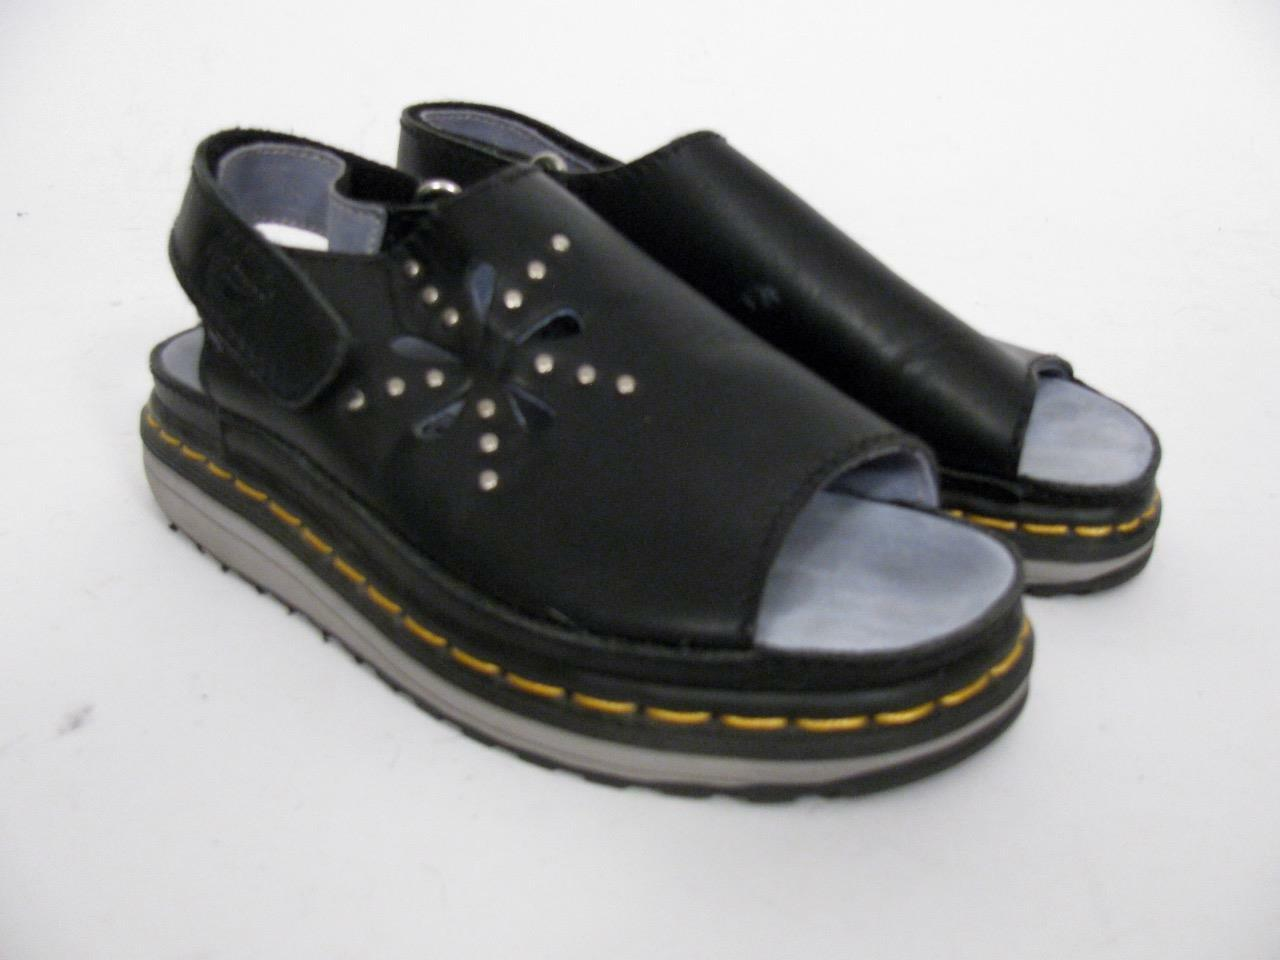 DR MARTENS DOC AIRWAIR SANDAL BLACK SLINGBACK LEATHER STUD DAISY CUTOUT SLINGBACK BLACK Schuhe6 0d3cdb